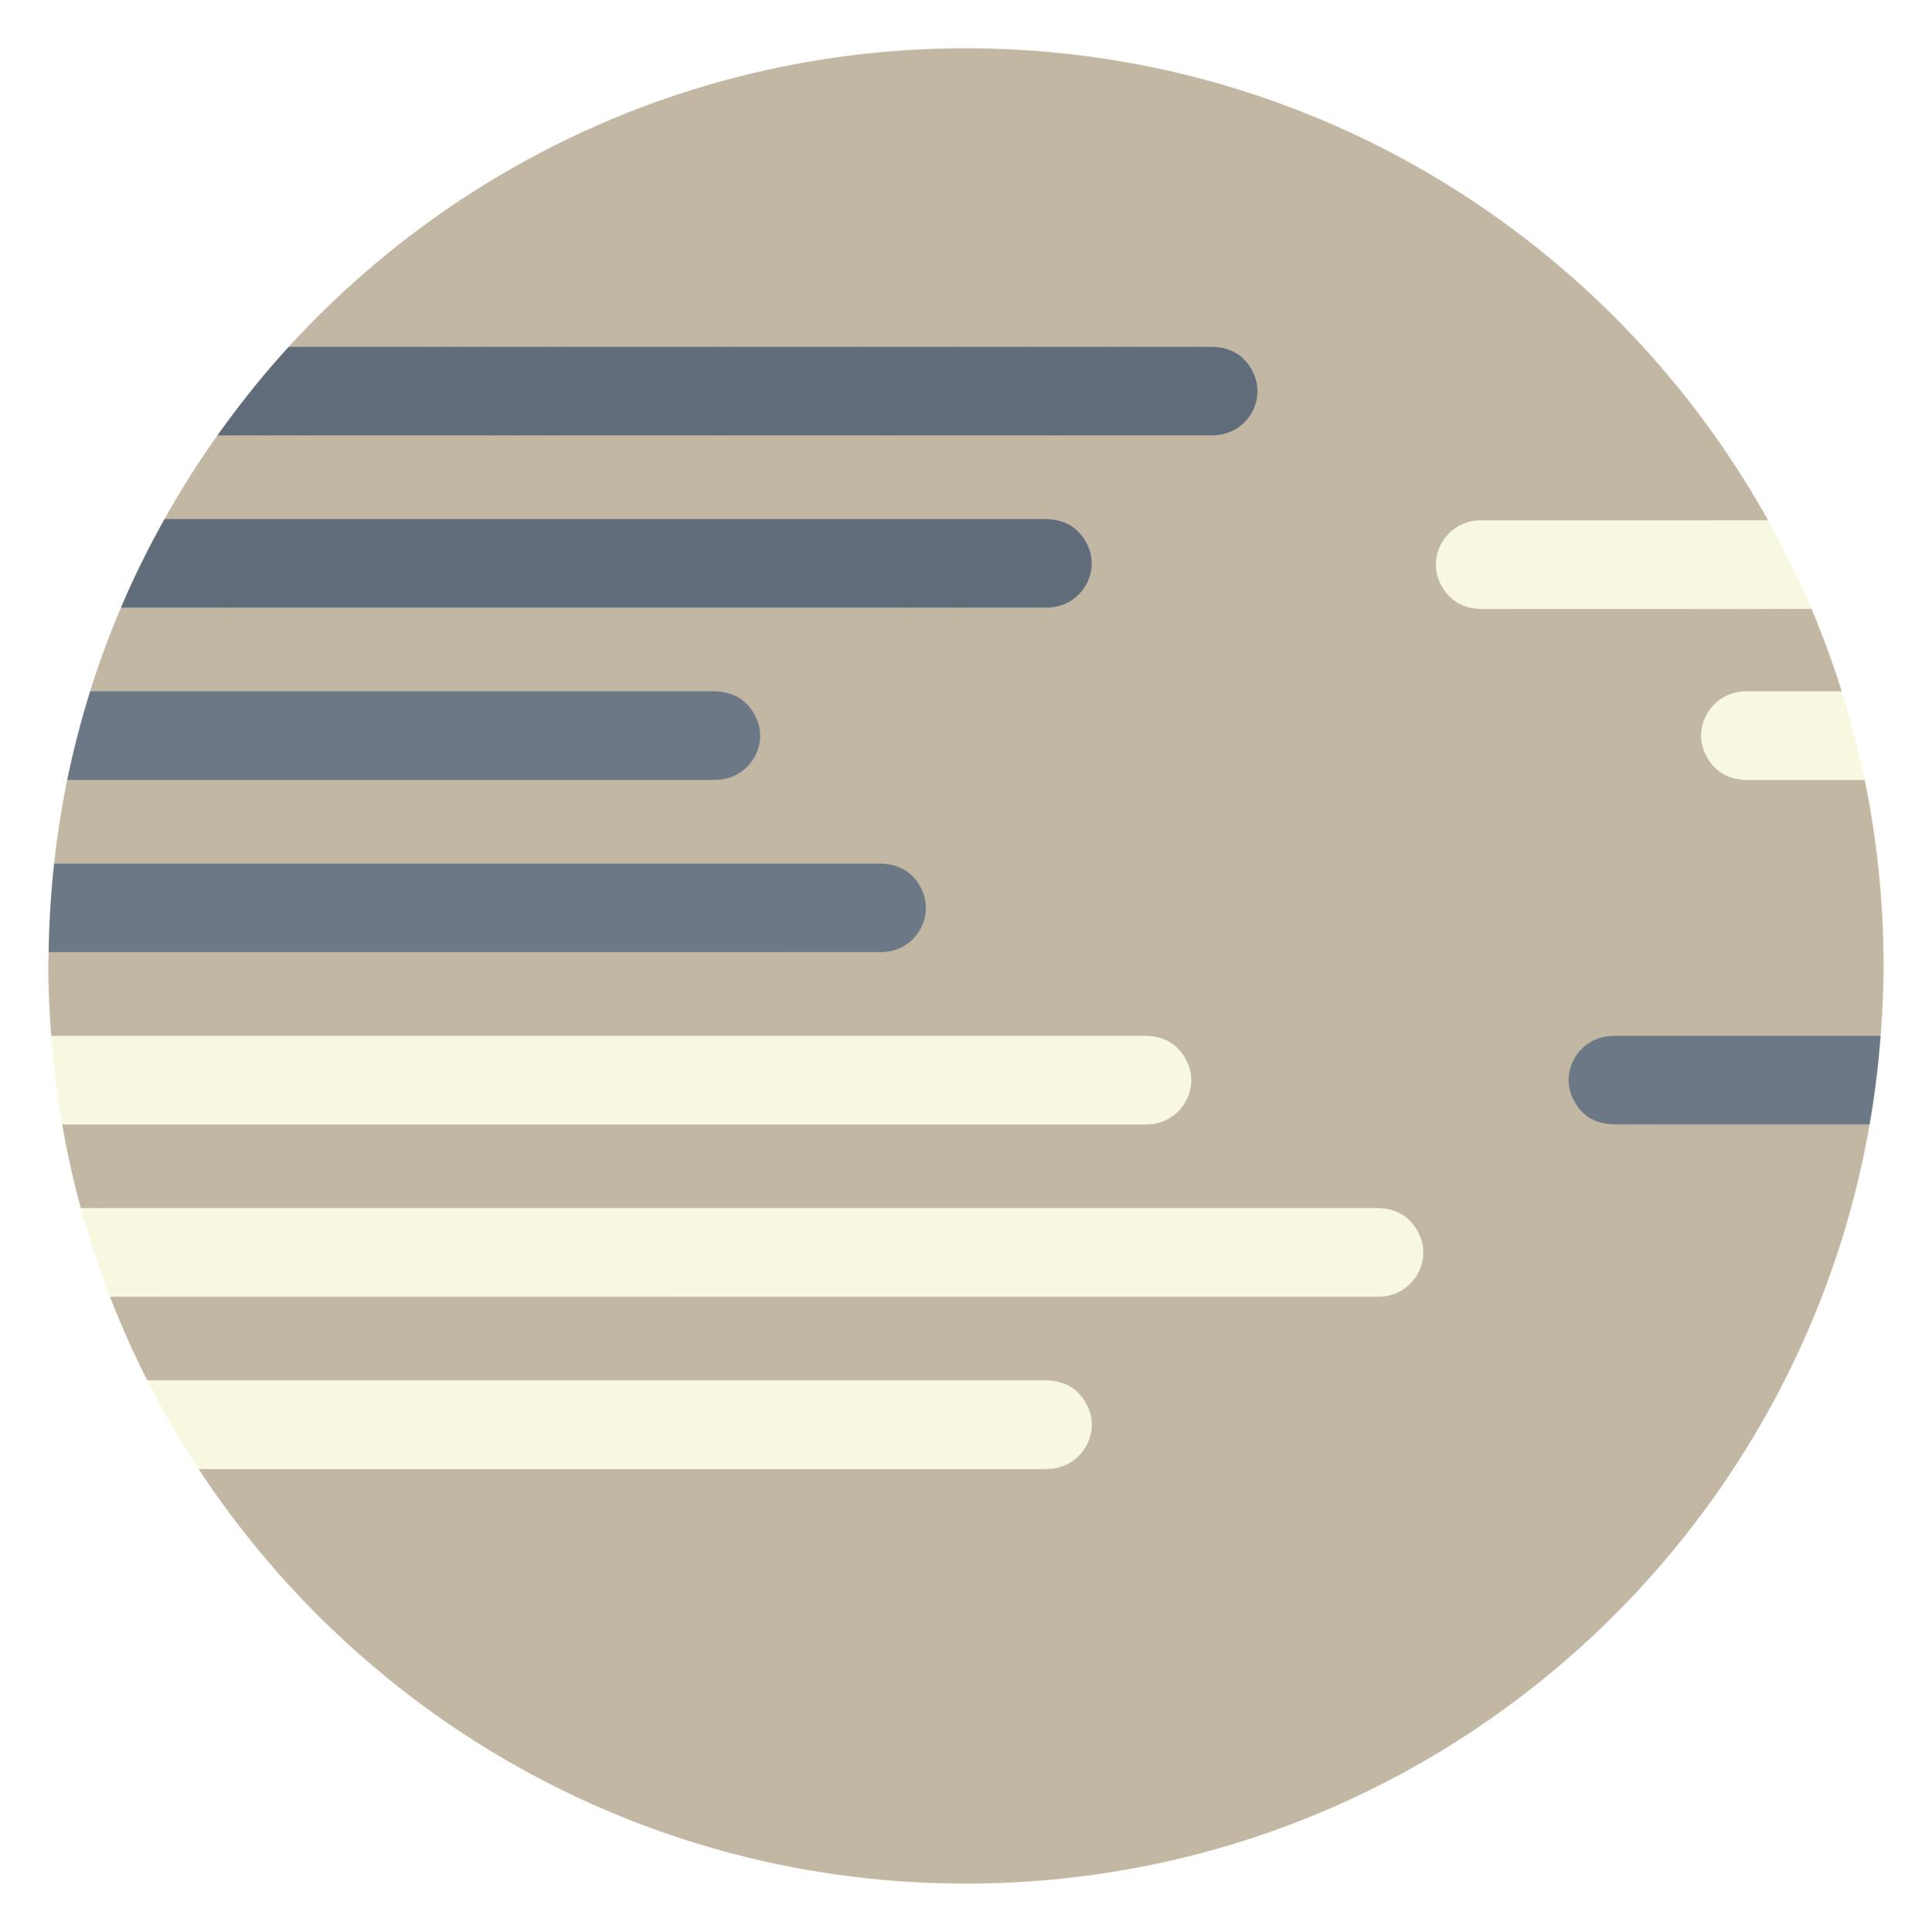 Lovsang_no_SPOR_tracks_profilbilde.png